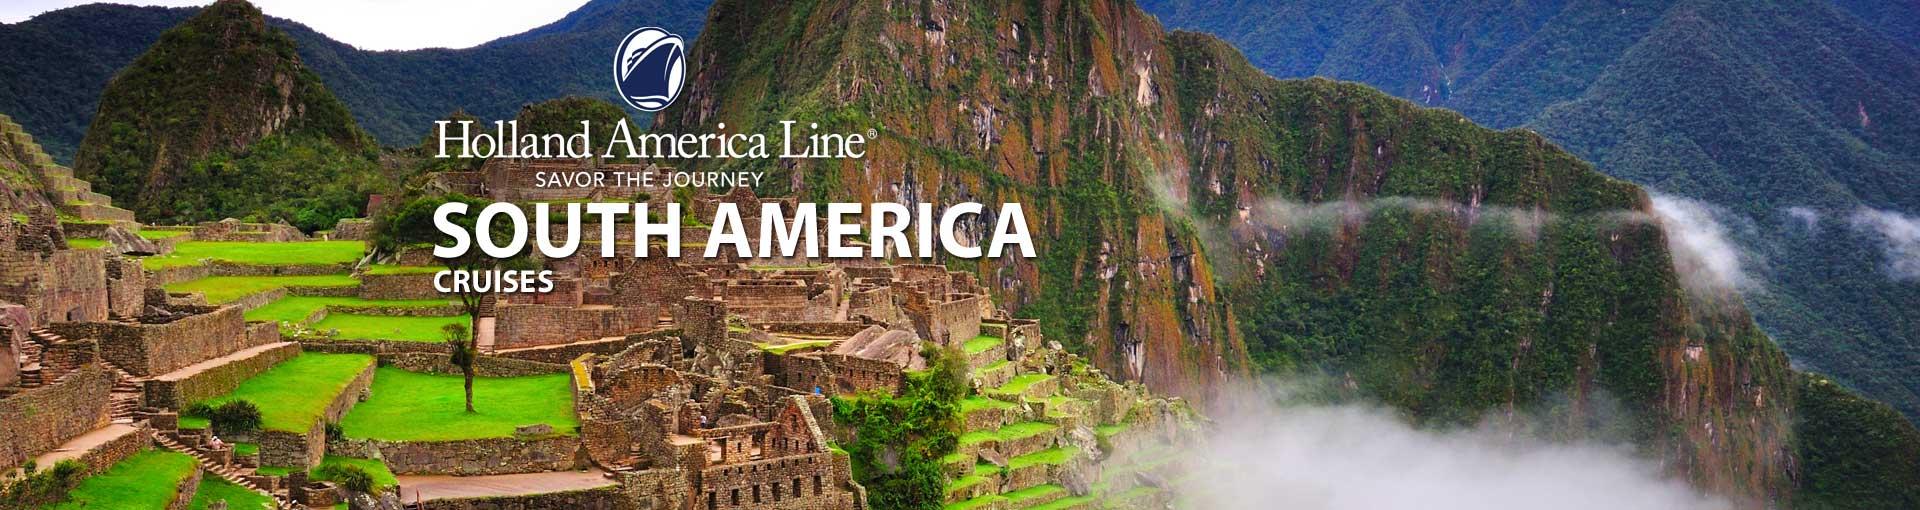 Holland America South America Cruises